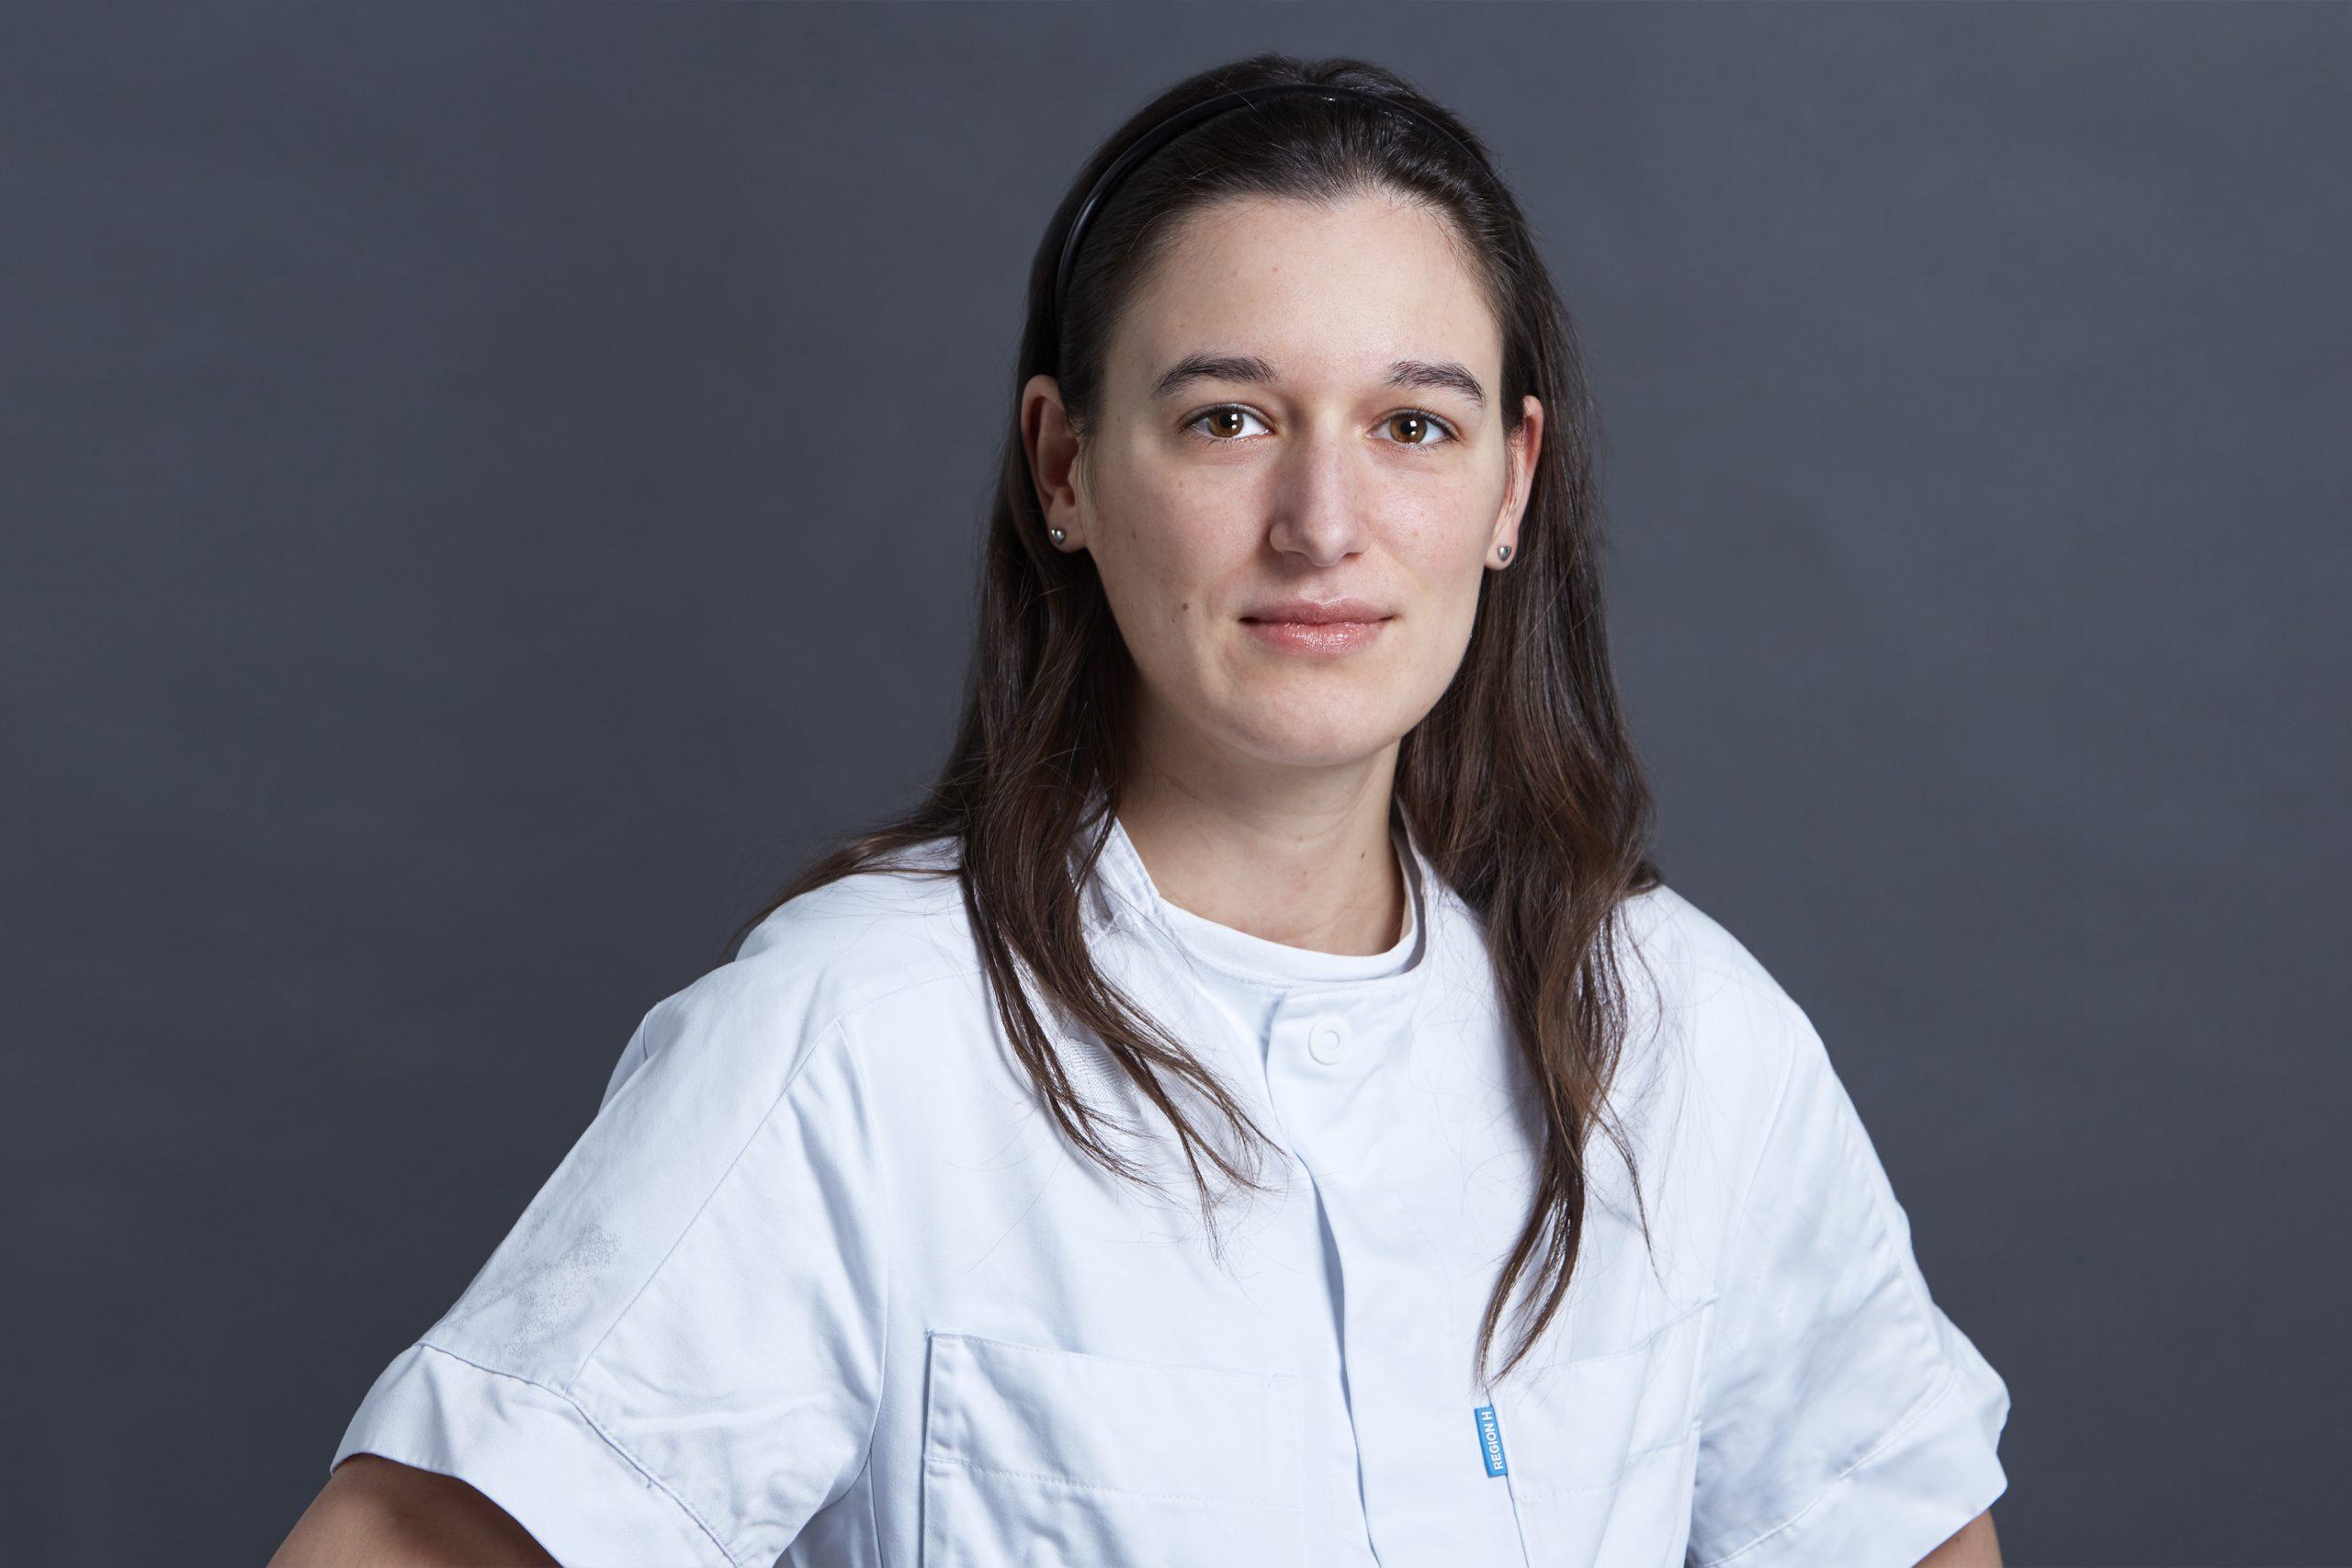 Nanna_Dyhre-Petersen_ALR5358_20x30cm